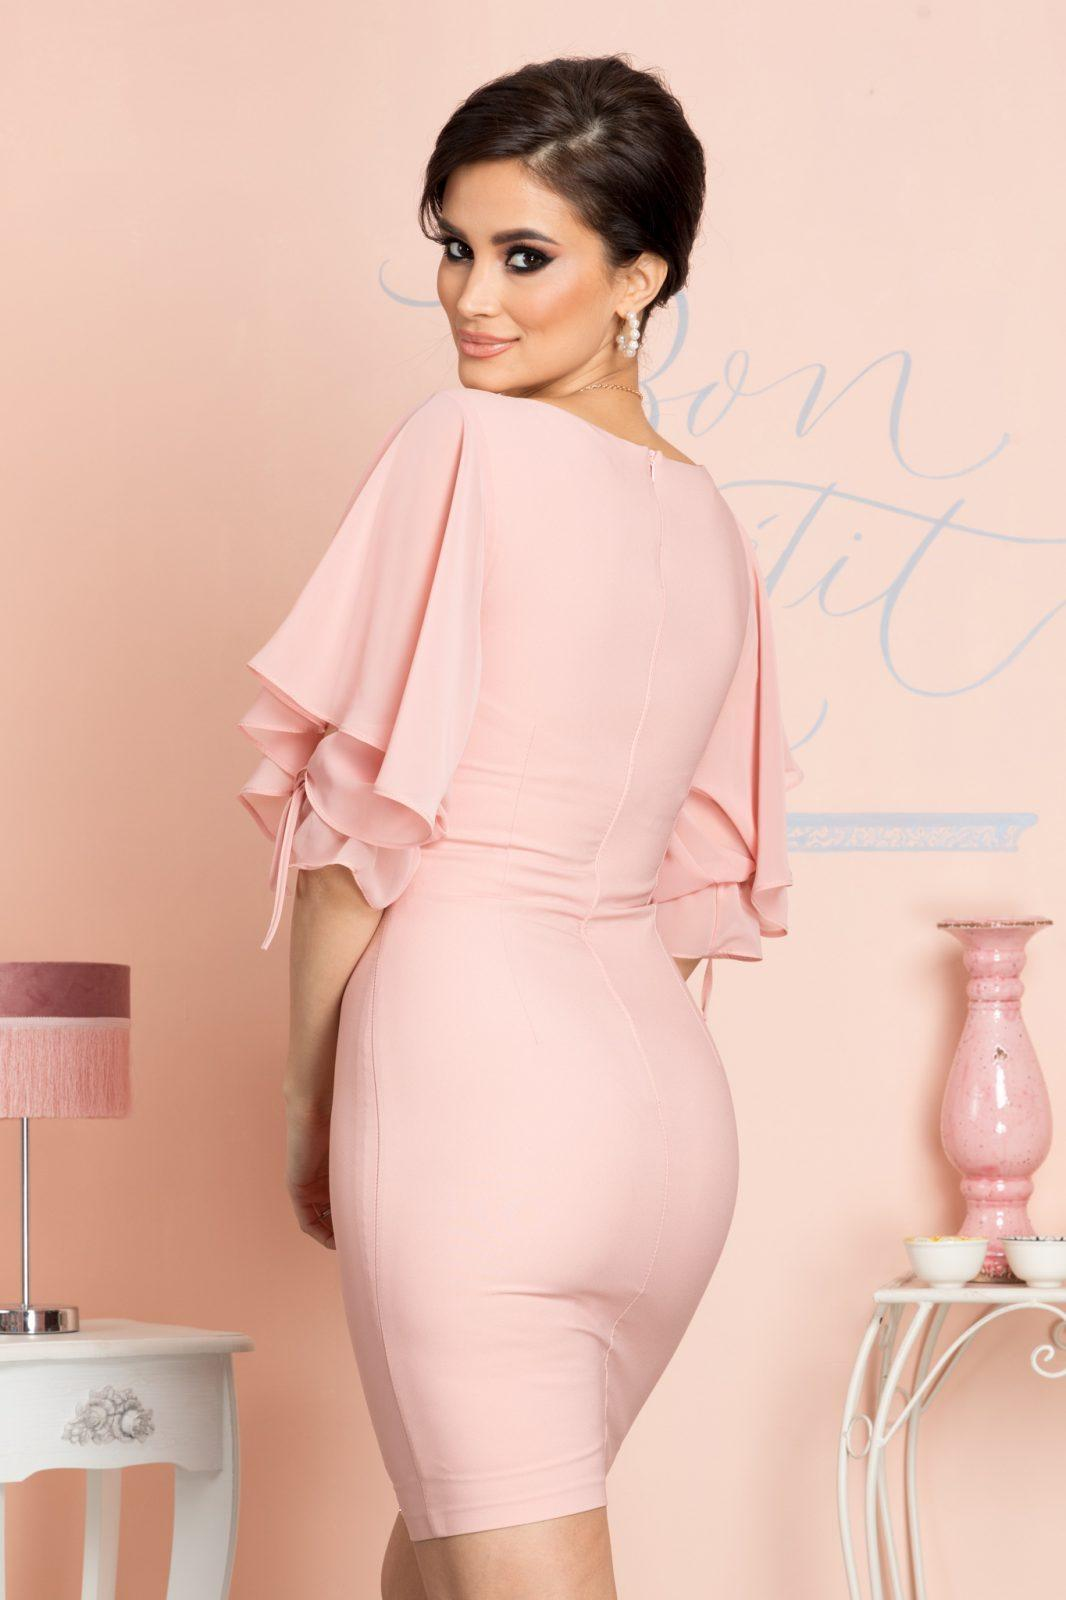 Karla Ροζ Φόρεμα 7072